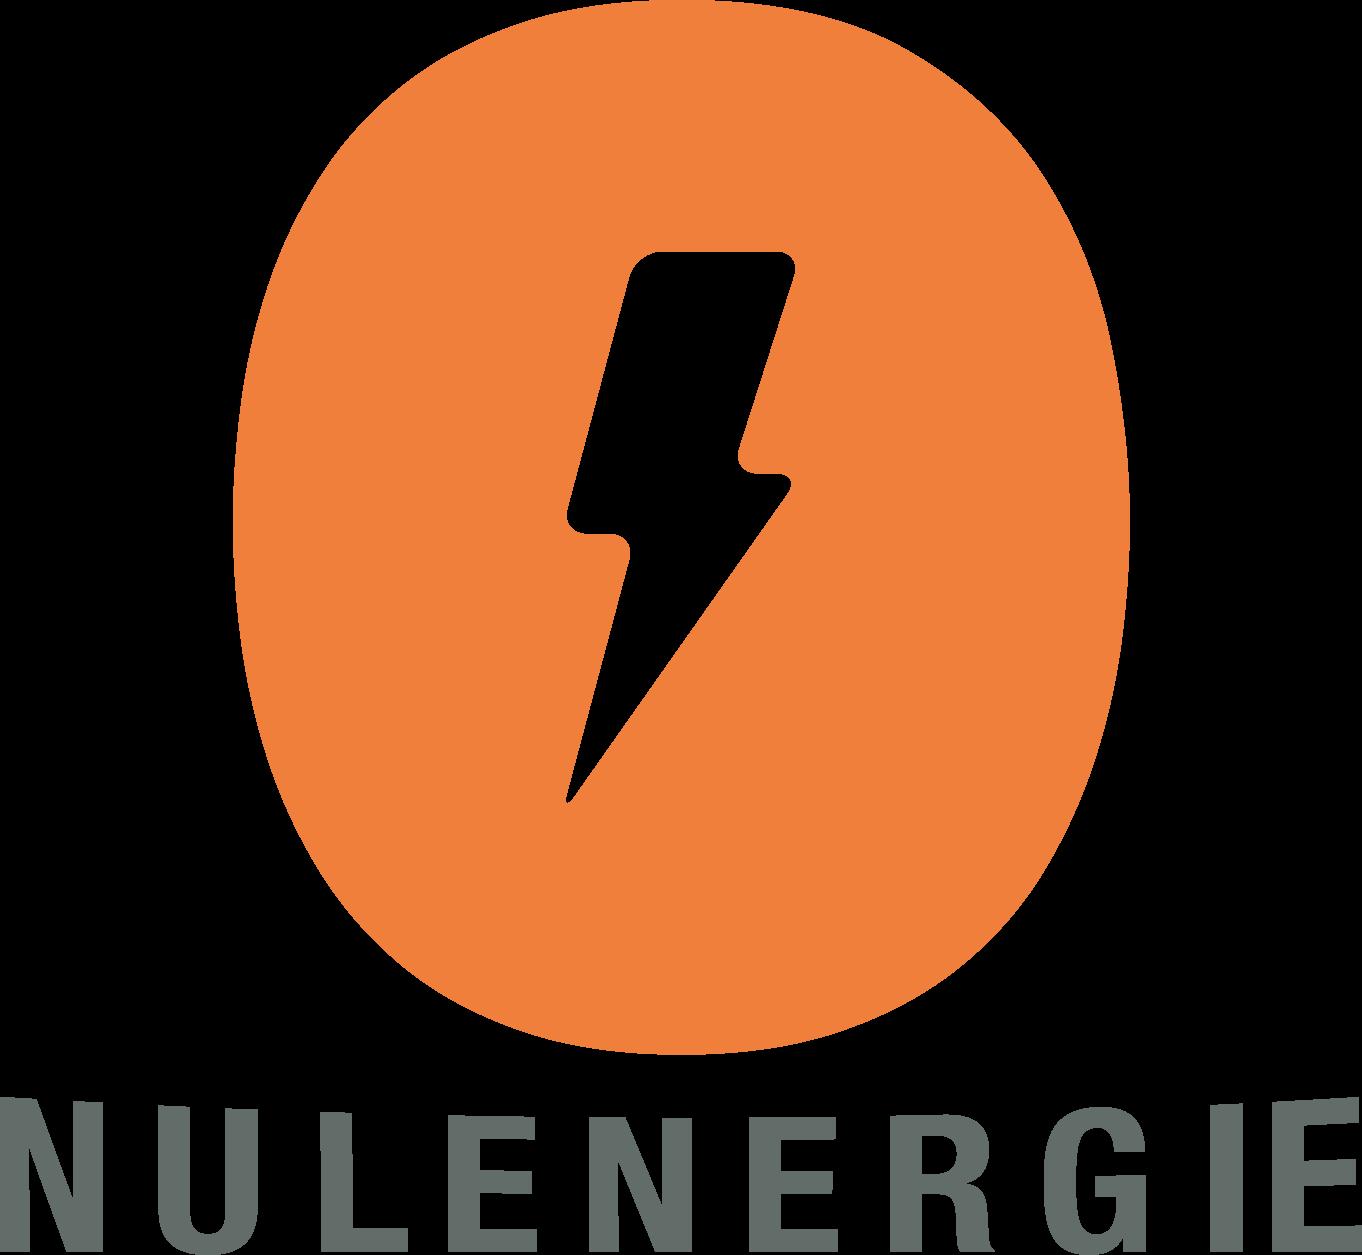 NULENERGIE